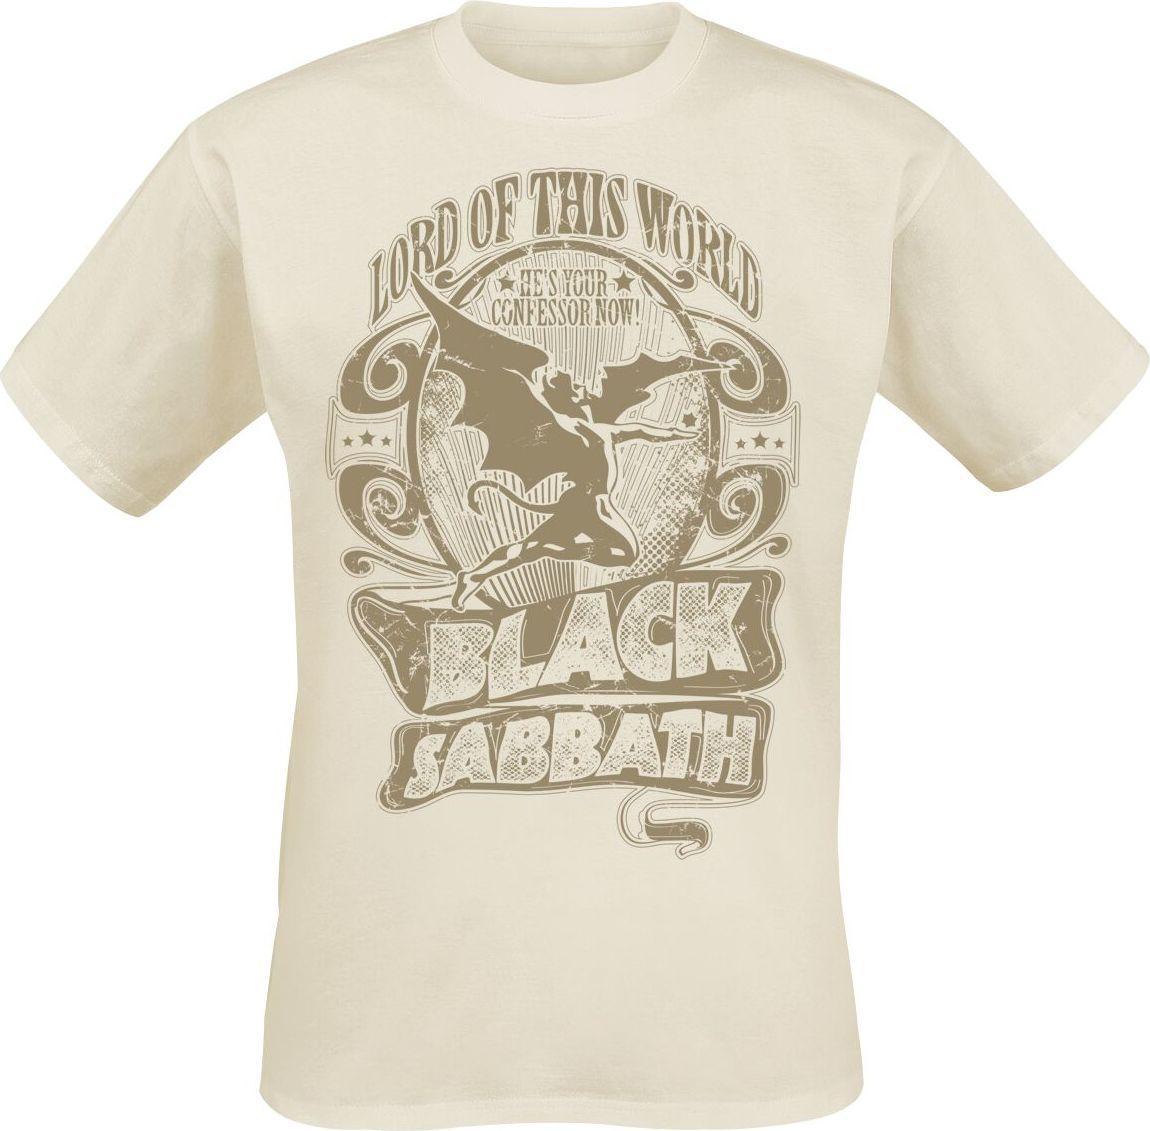 Black Sabbath Lord Of This World tricko přírodní